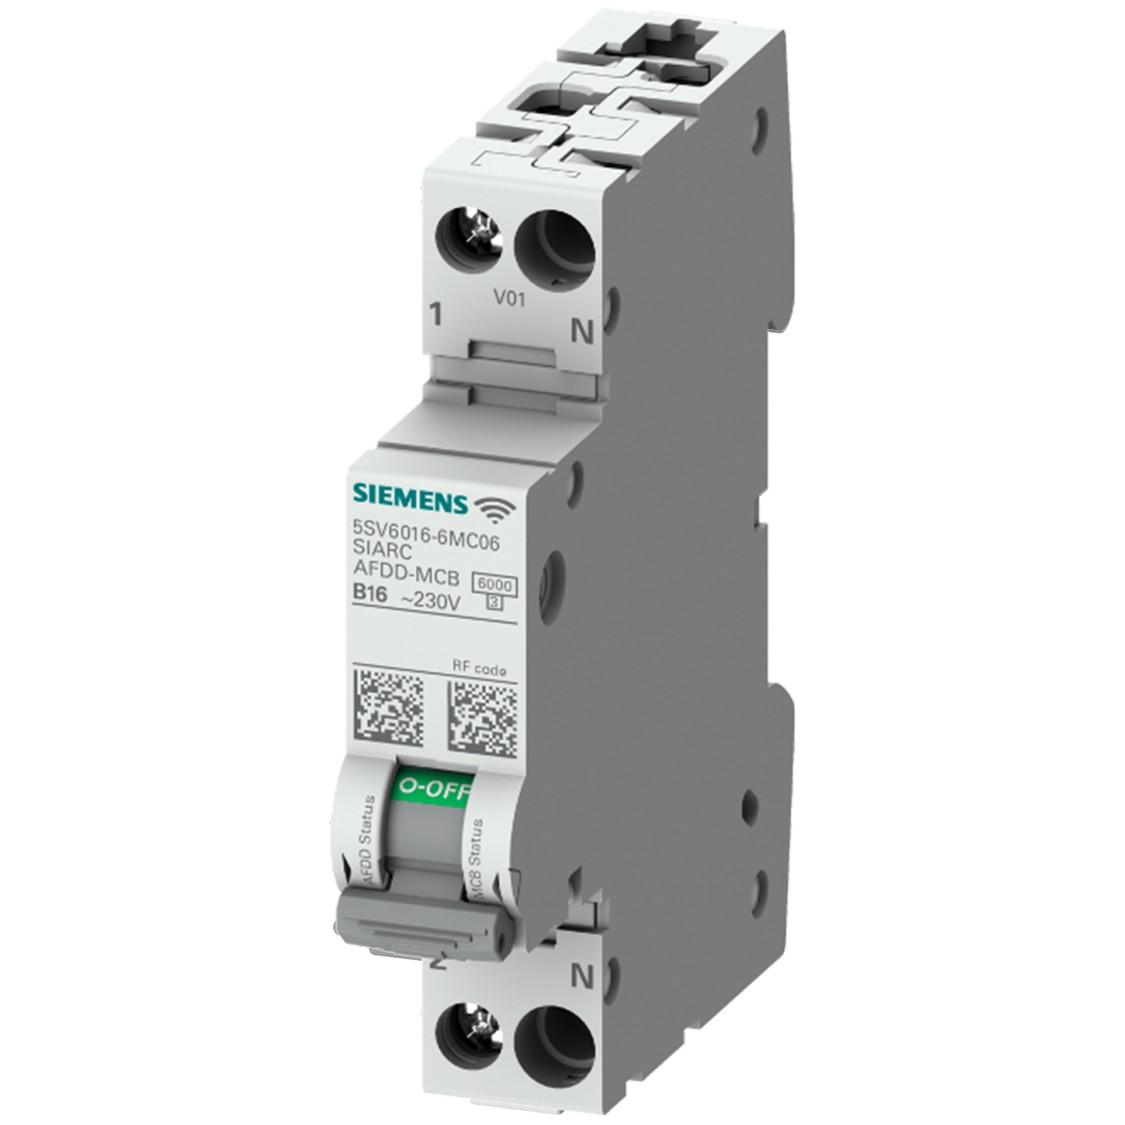 Brandschutz mit dem AFDD/LS-Schalter 5SV6 COM